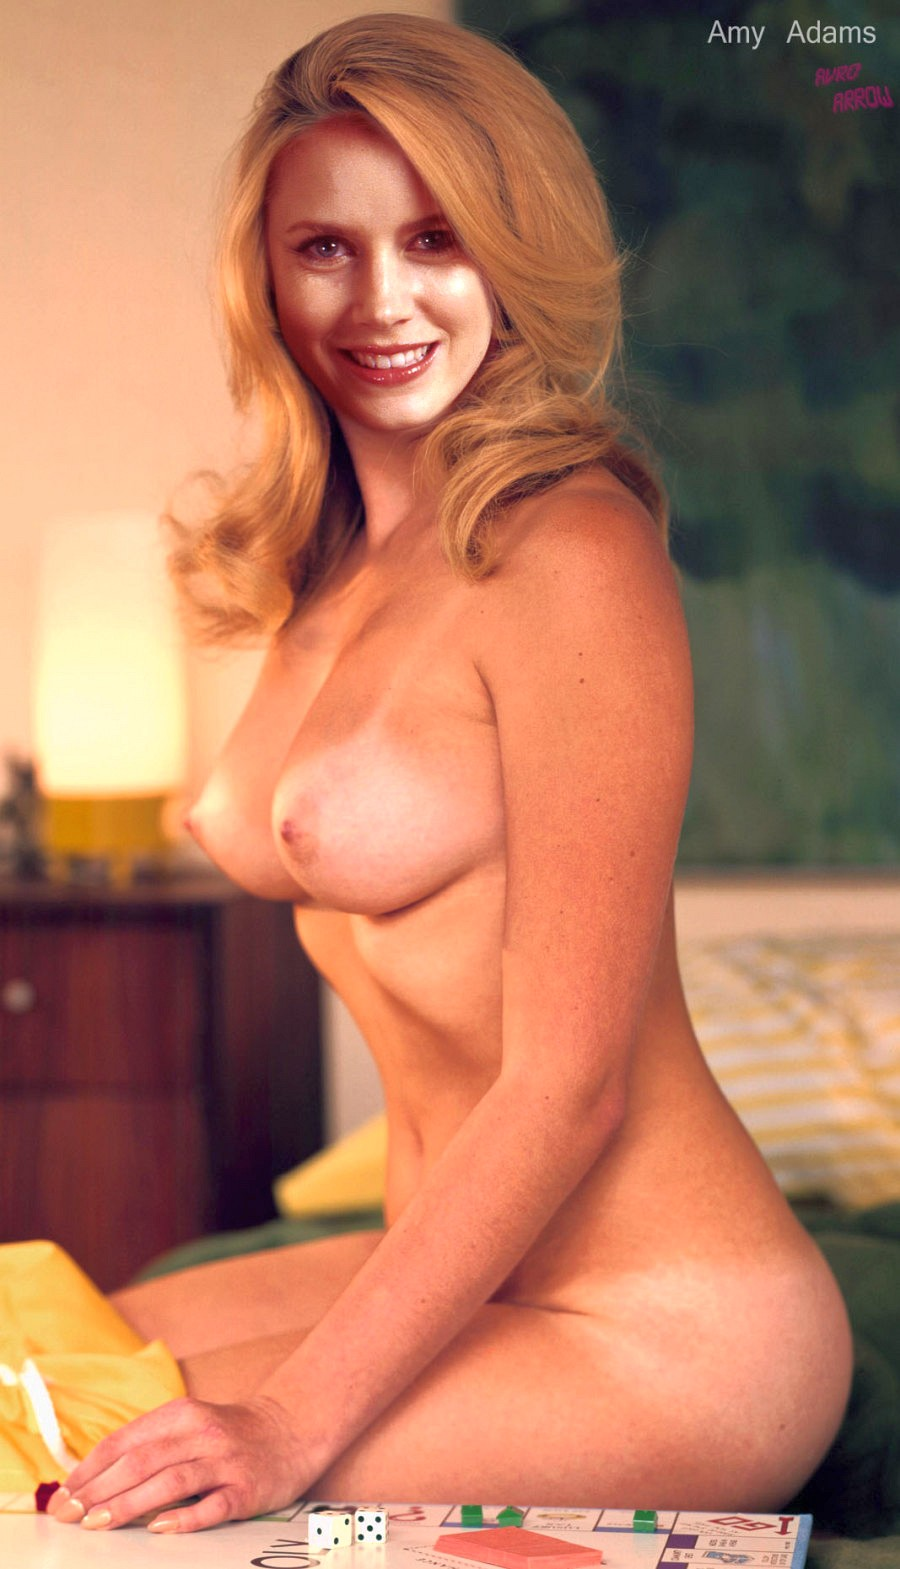 Amy Adams Nude Fakes